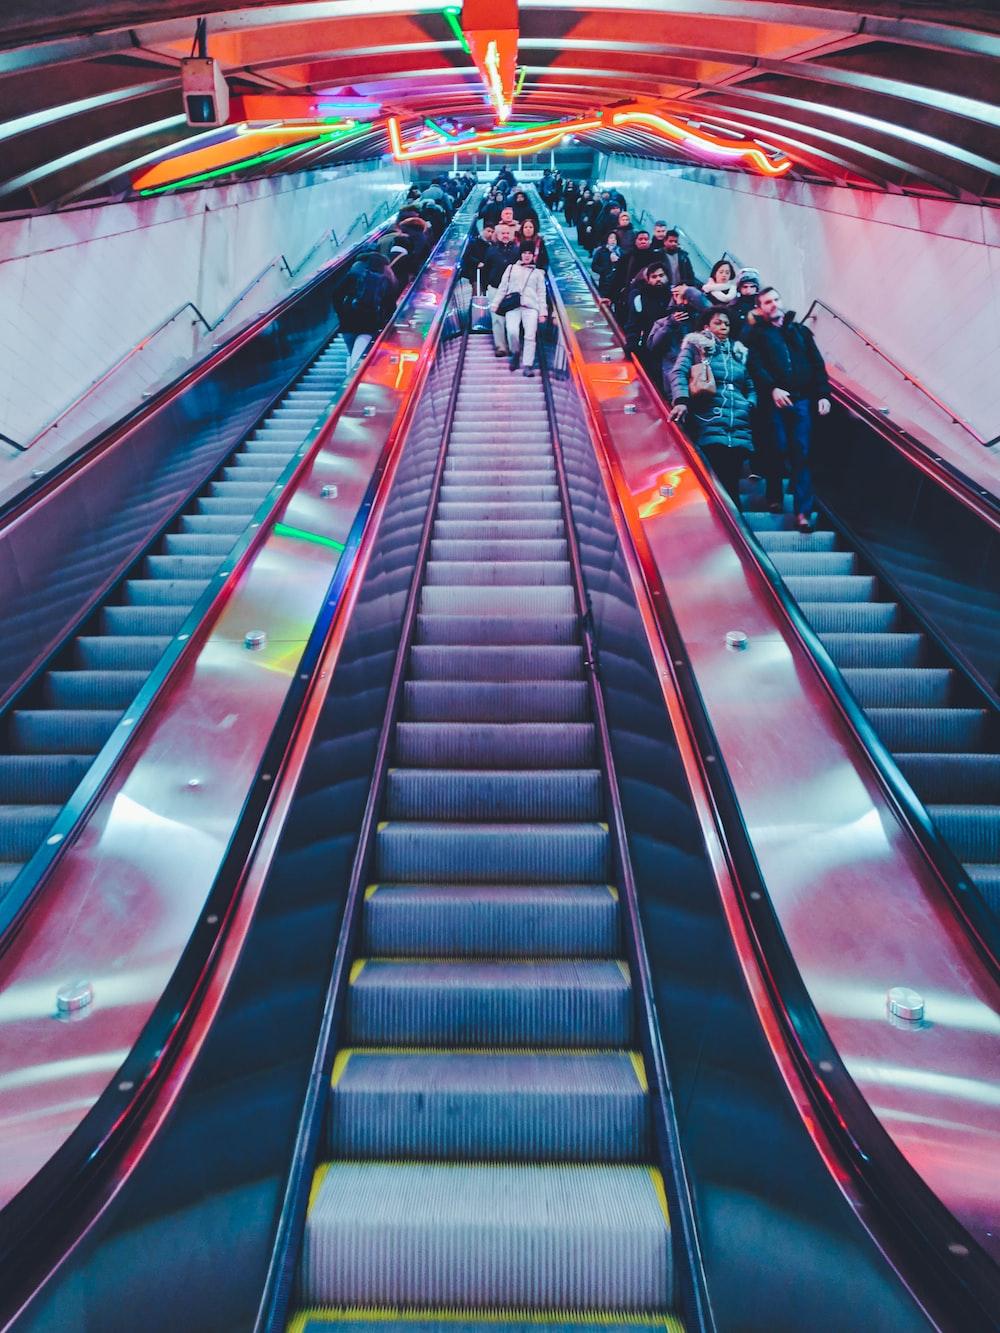 people on escalator going down